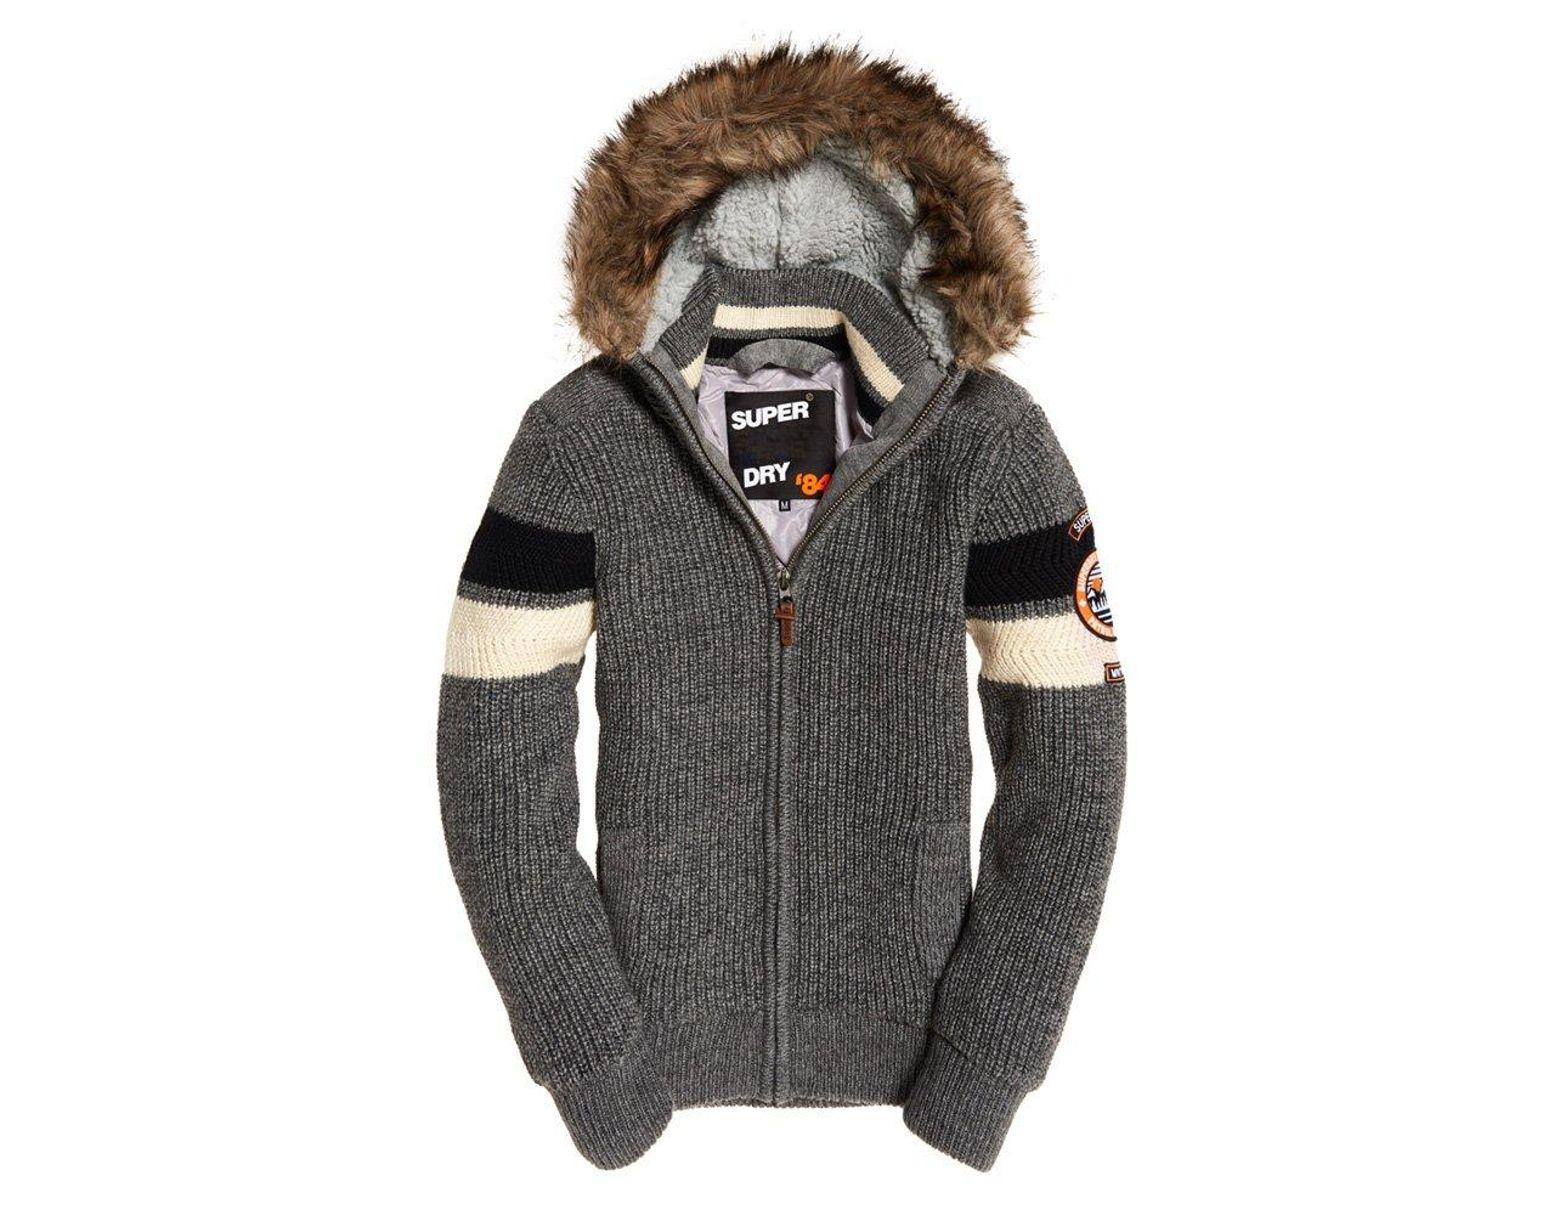 243096c8 Superdry Super Ski Dog Hoodie in Gray for Men - Lyst